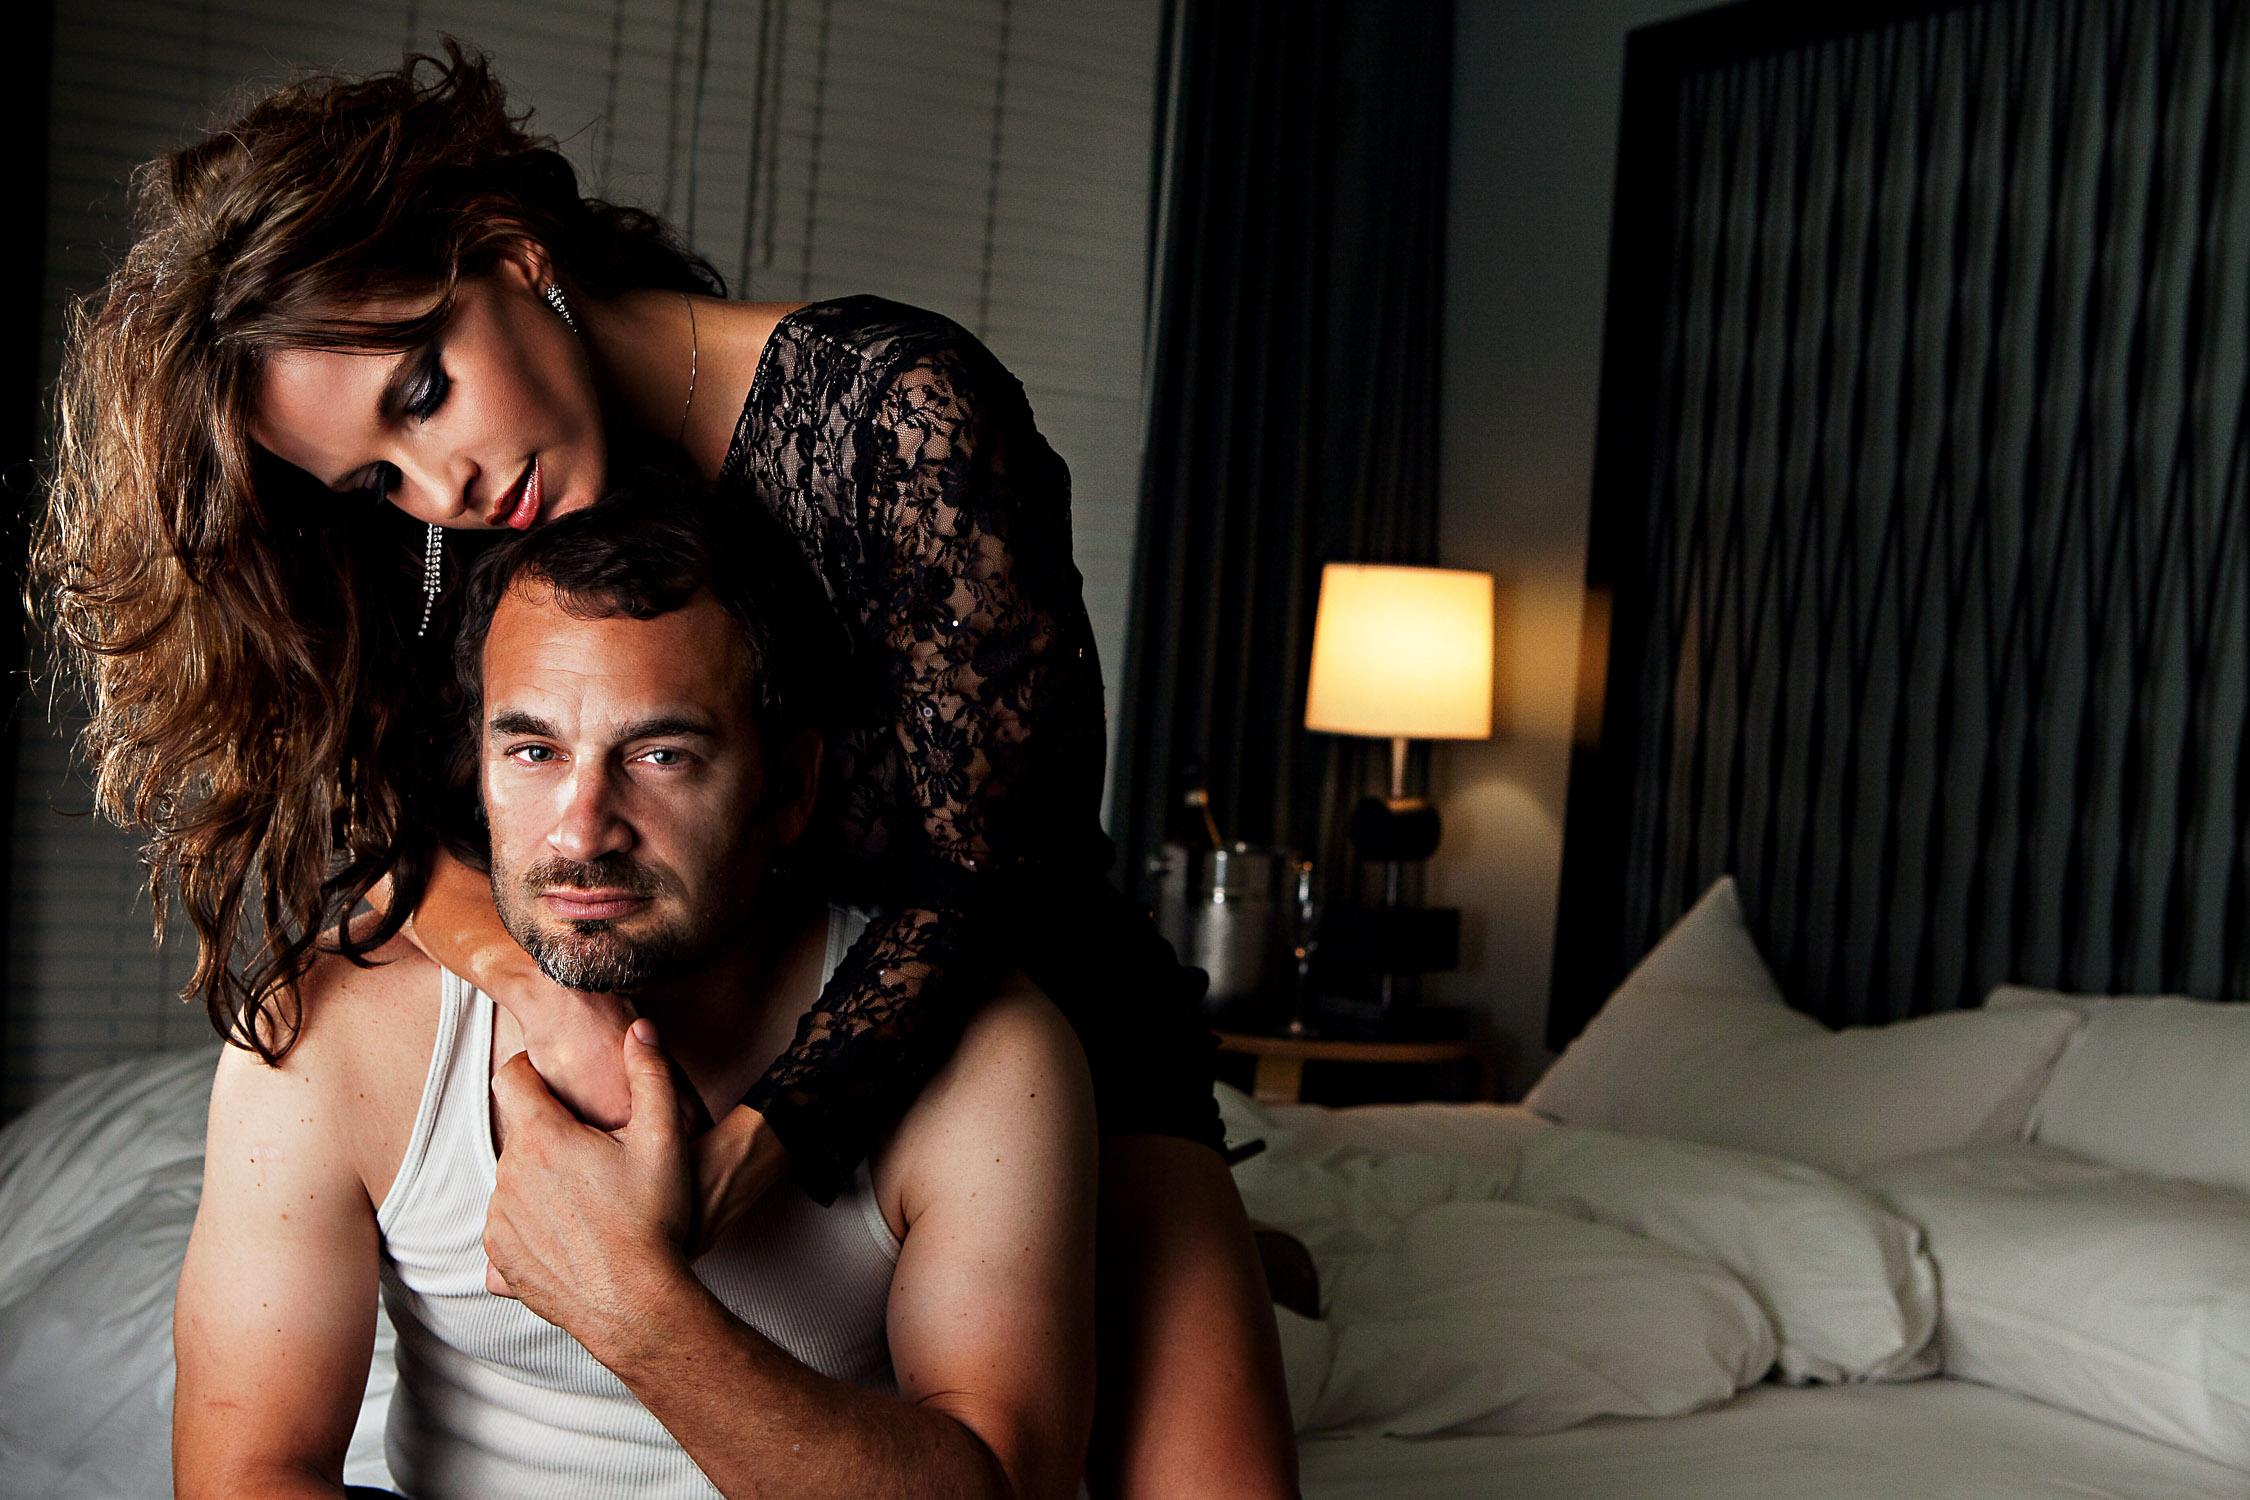 sexy-hotel-room-engagement.jpg